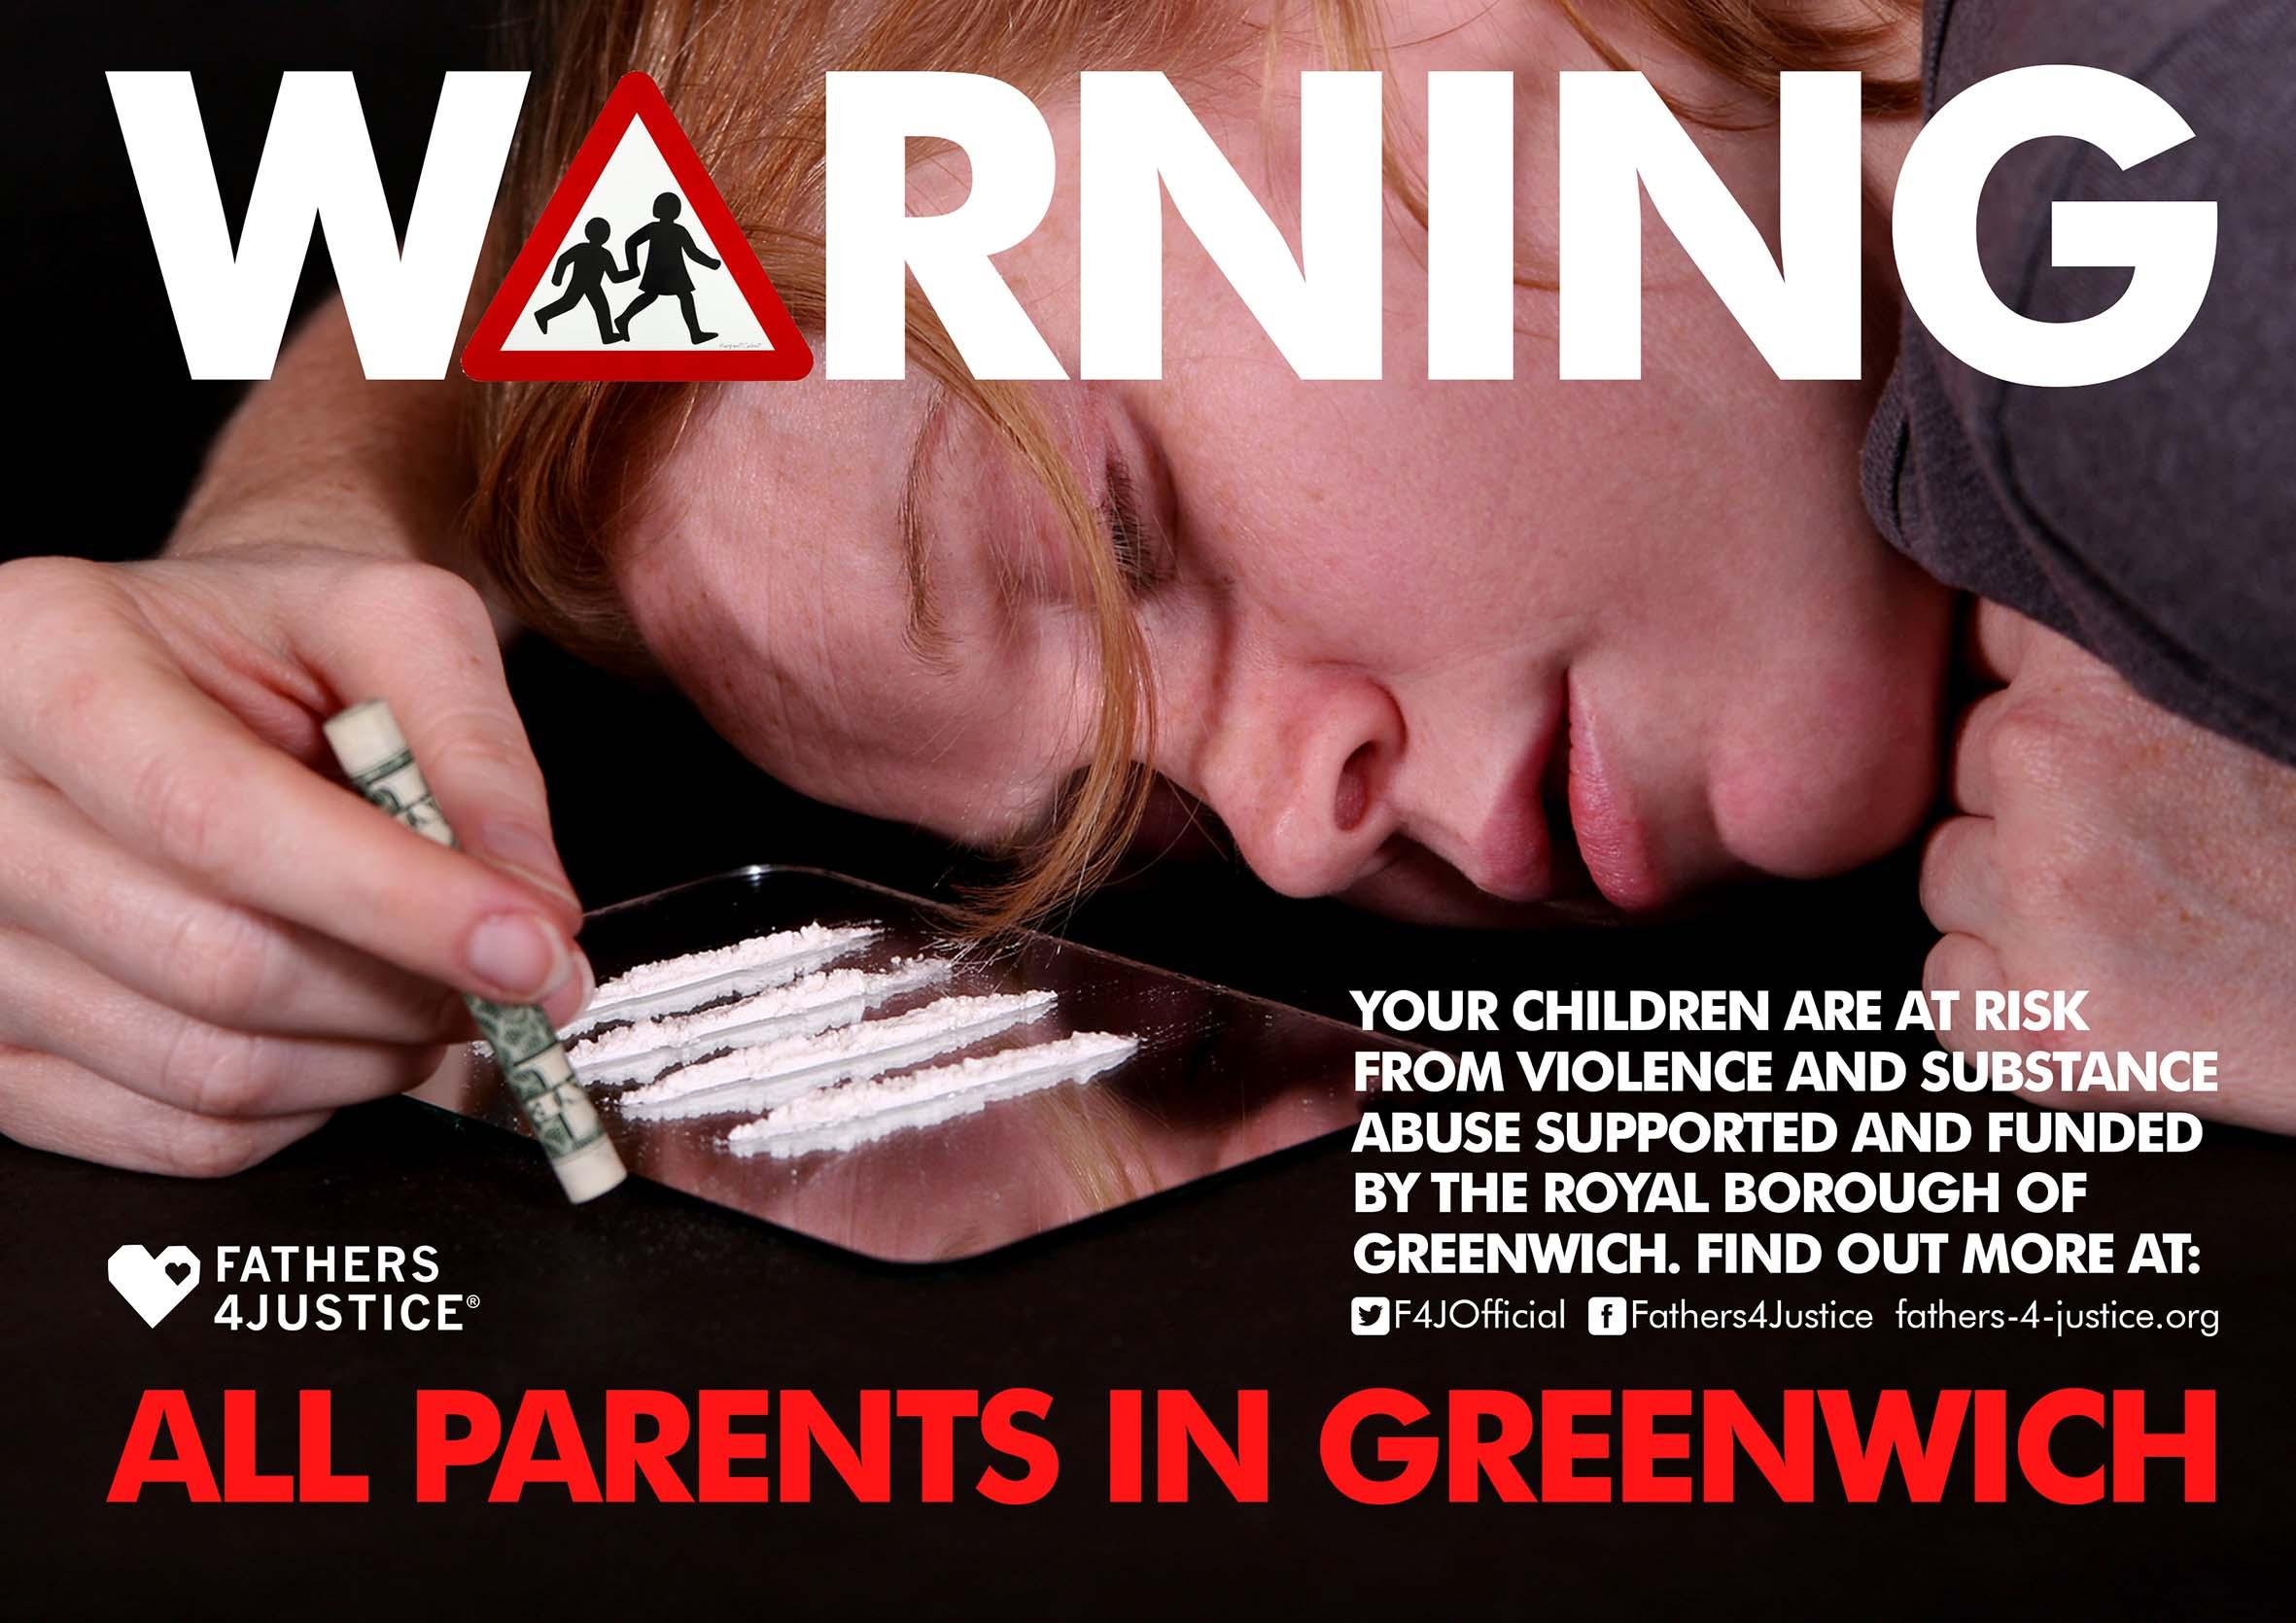 GREENWICH AD